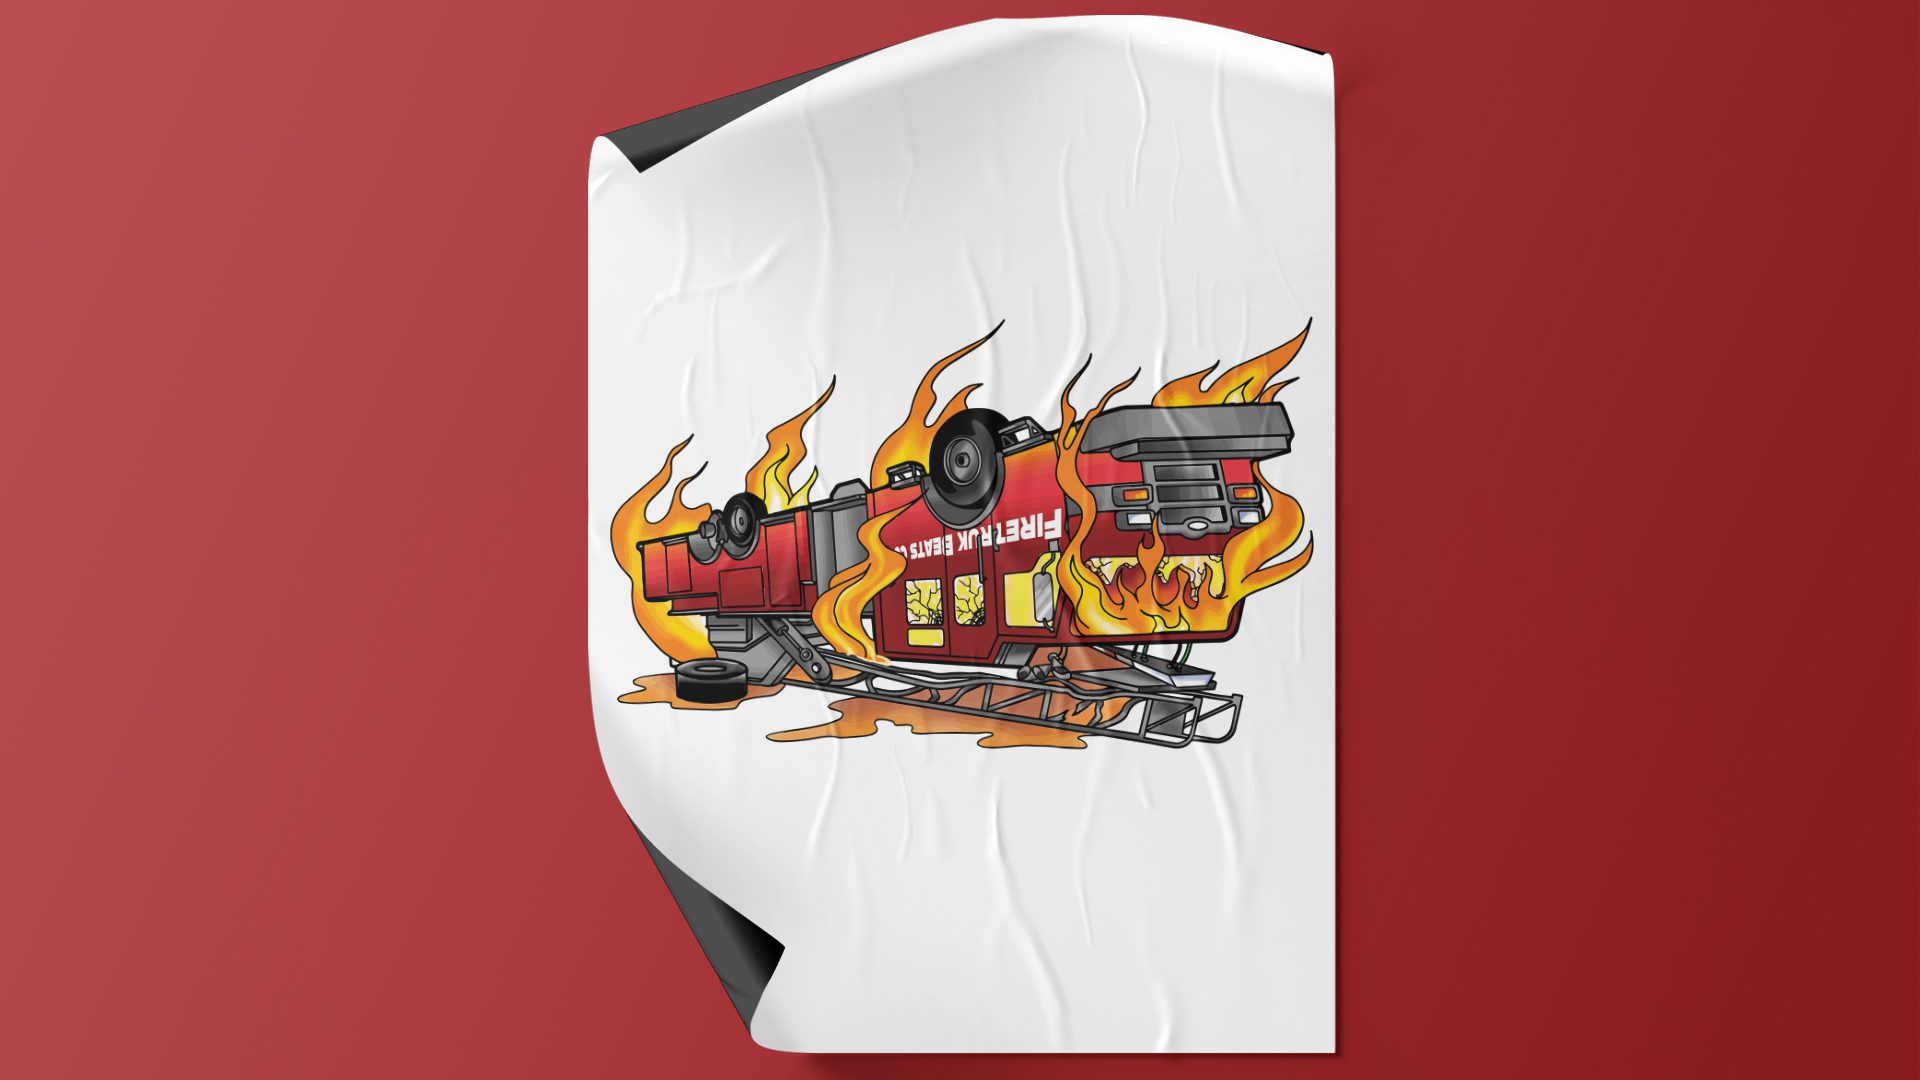 DJ Fireturk - Firetruck Album Art Design Mockup 04